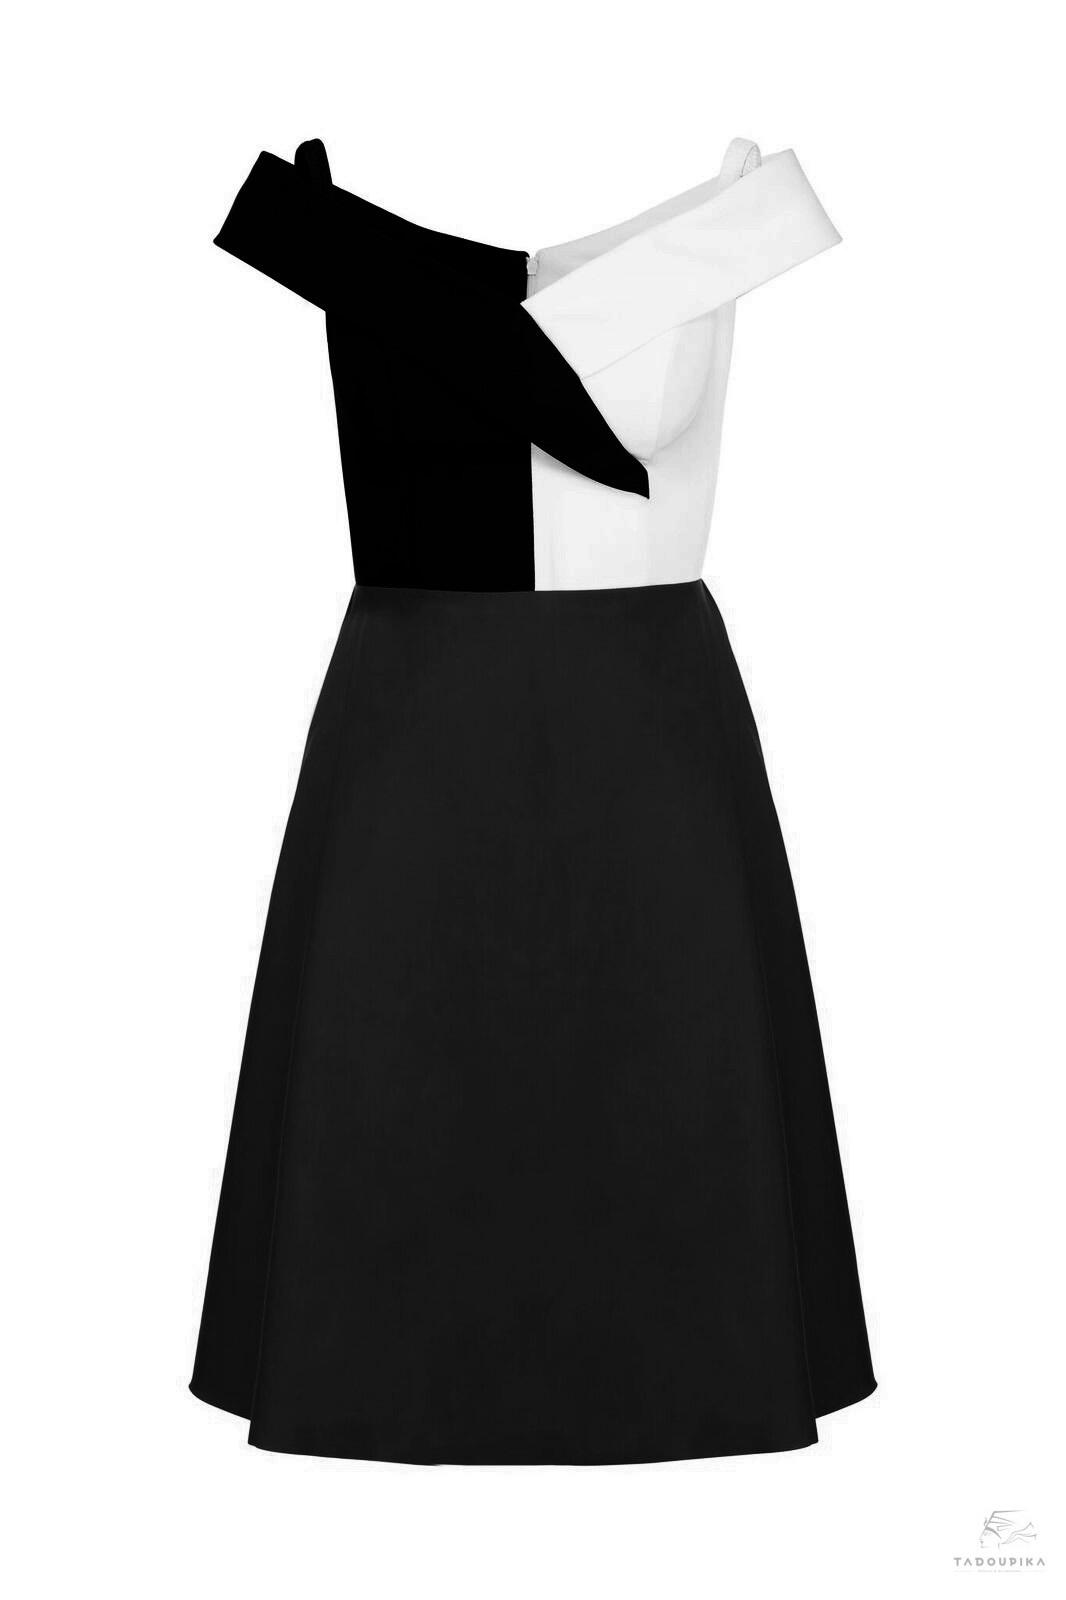 robe brigitte noire blanc contrast illusion dress custom dress personnalisable plsu siz curve france mode femme magazine defile ete summer wedding garen party france face tadoupika